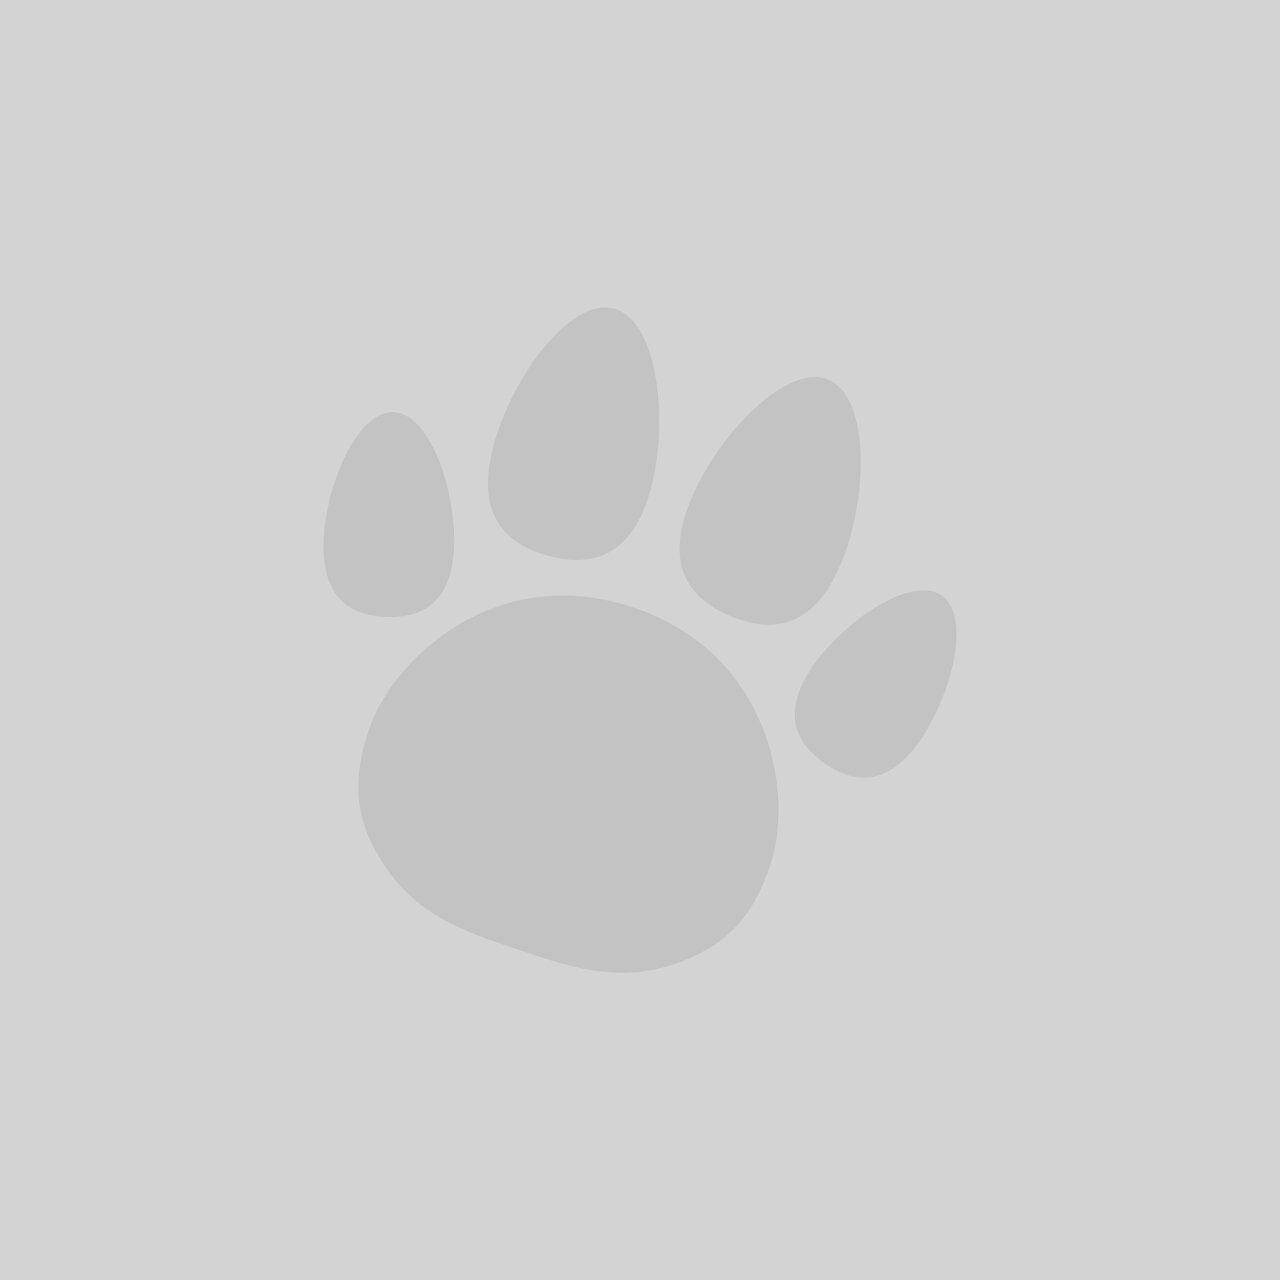 Doodlebone Airmesh Dog Harness Orange (size options)